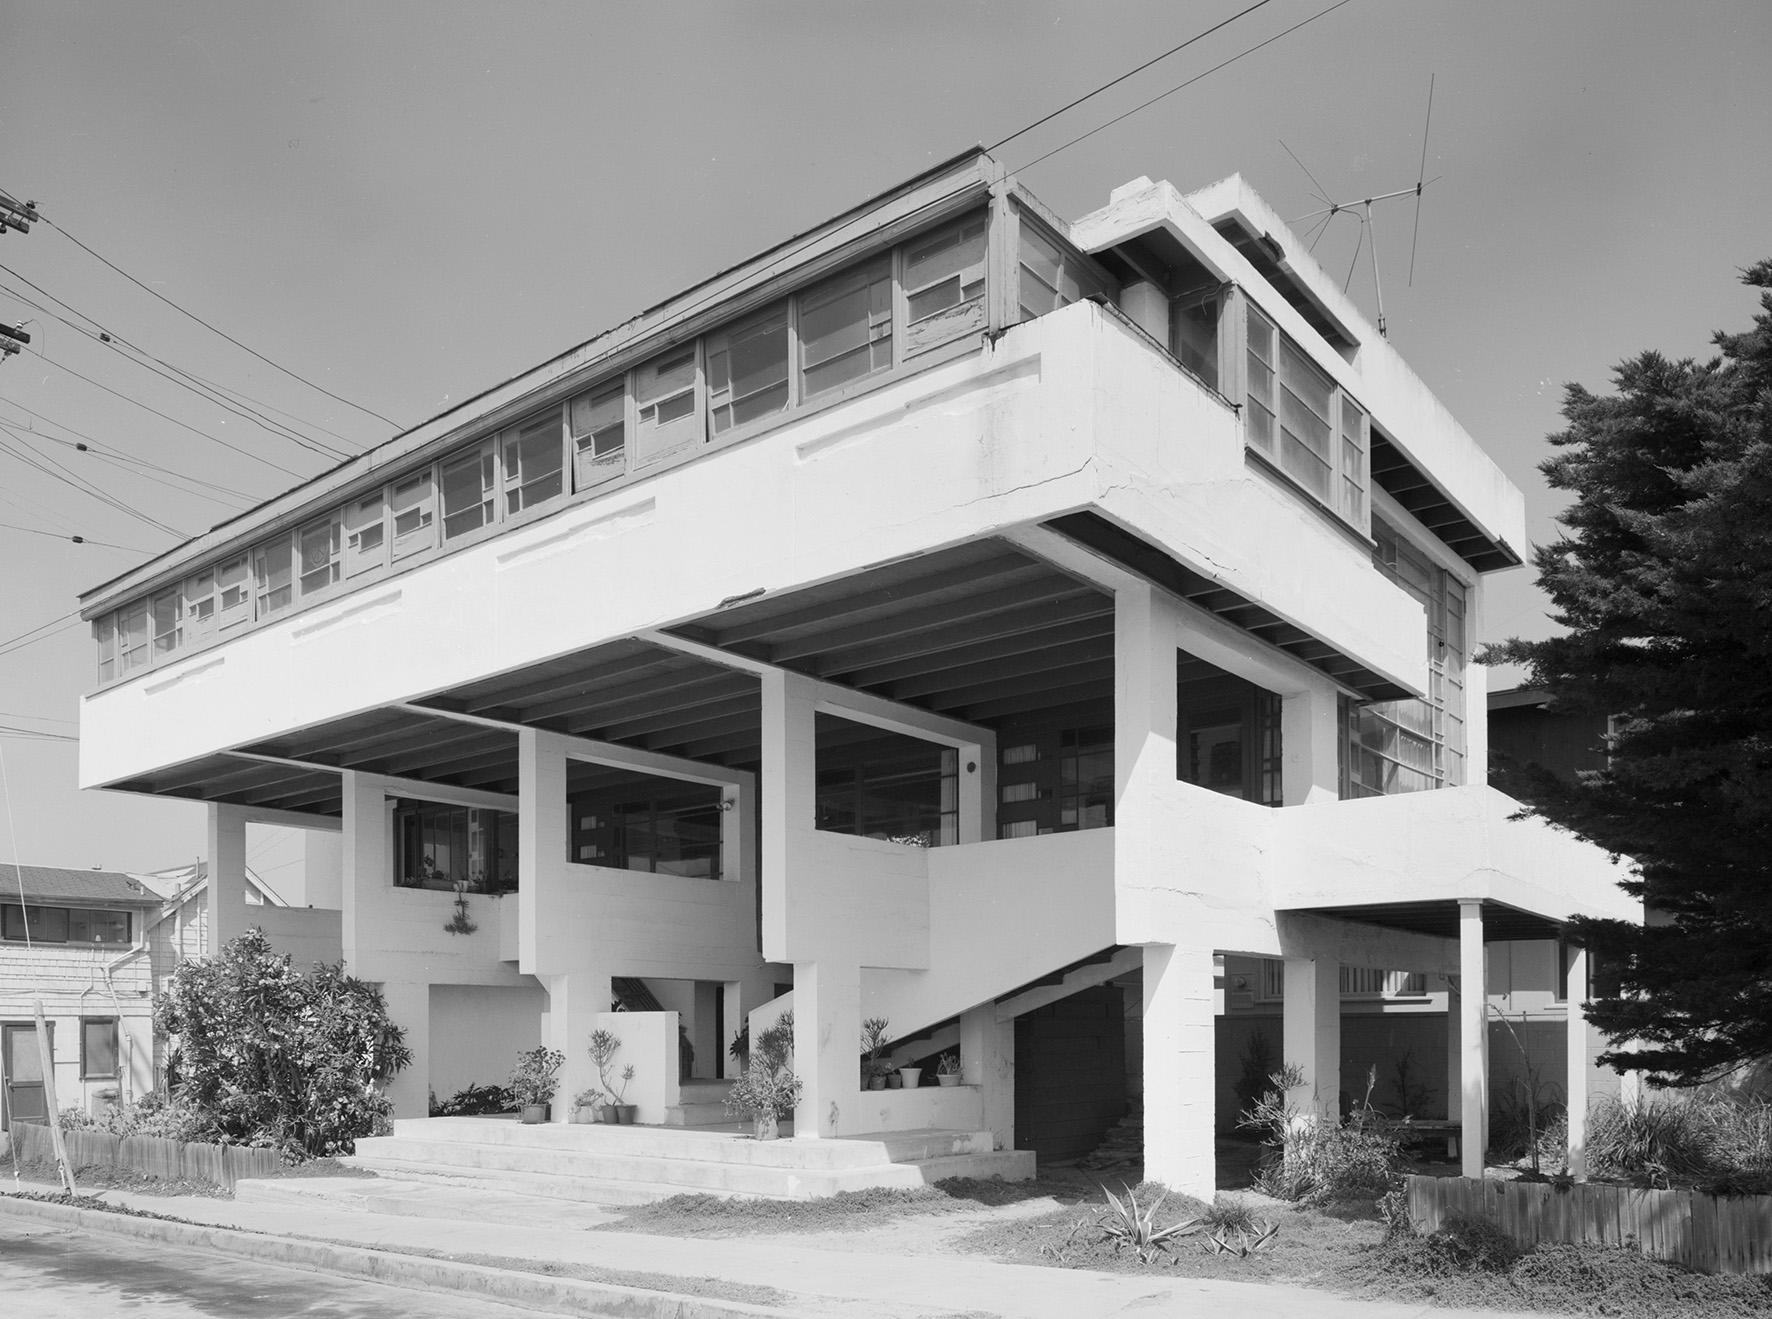 Newport Beach Magazine Architectural - 484.0KB